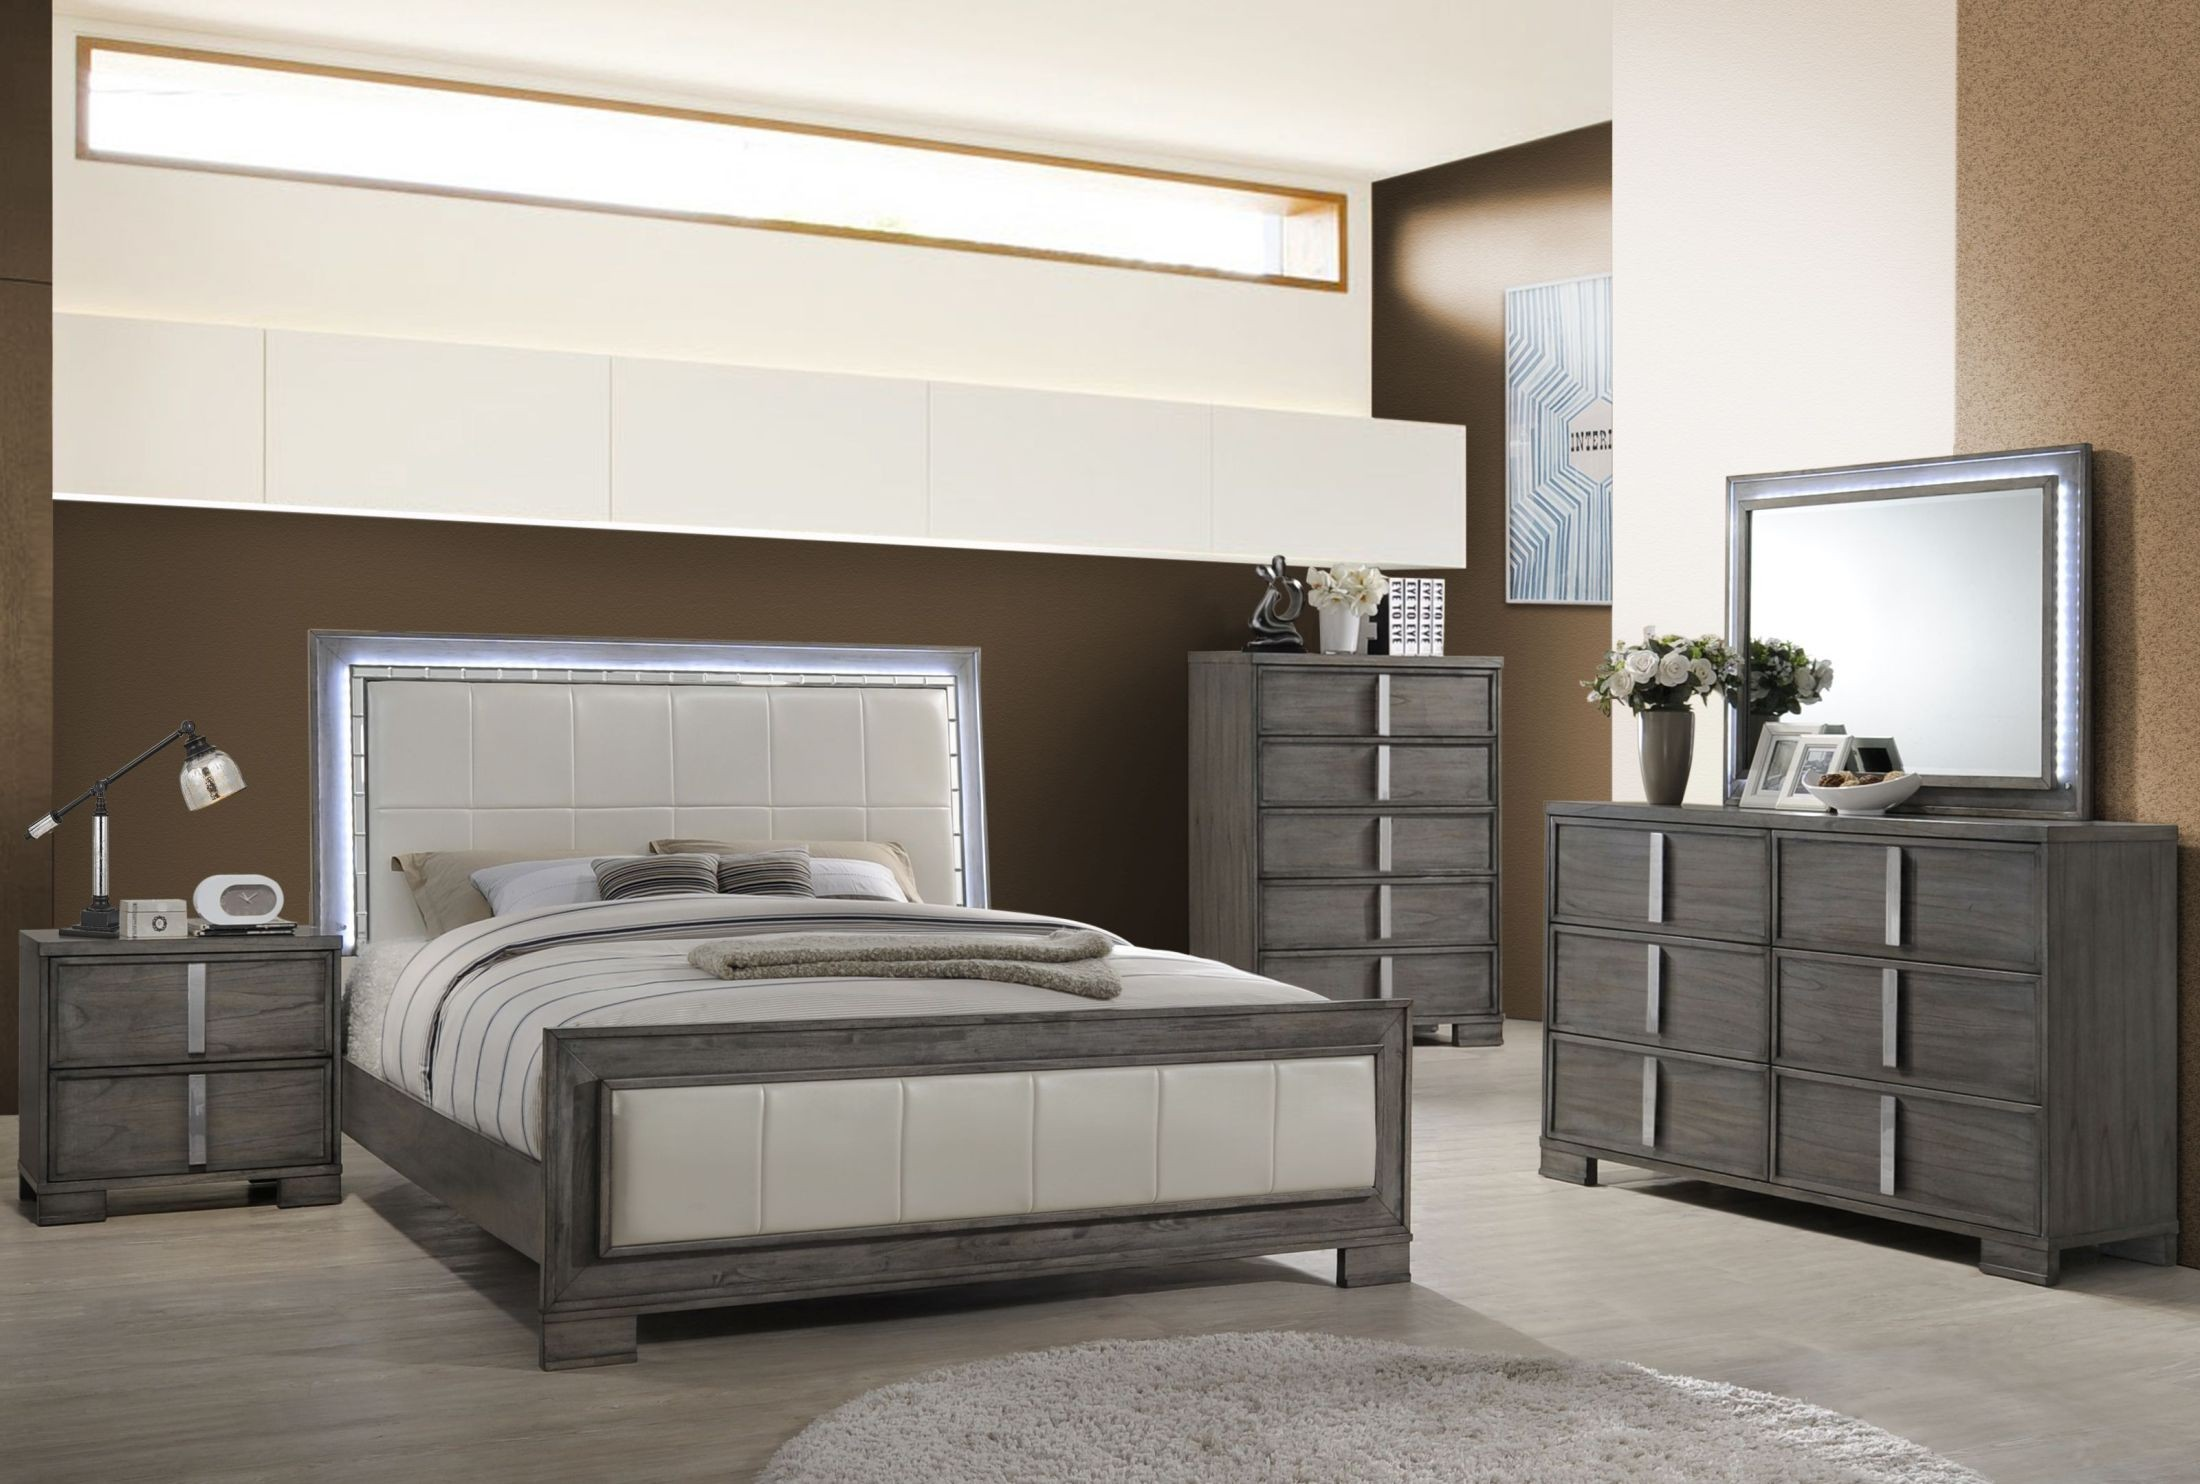 Edgewater Gray Panel Bedroom Set B9731 310 320 330 New